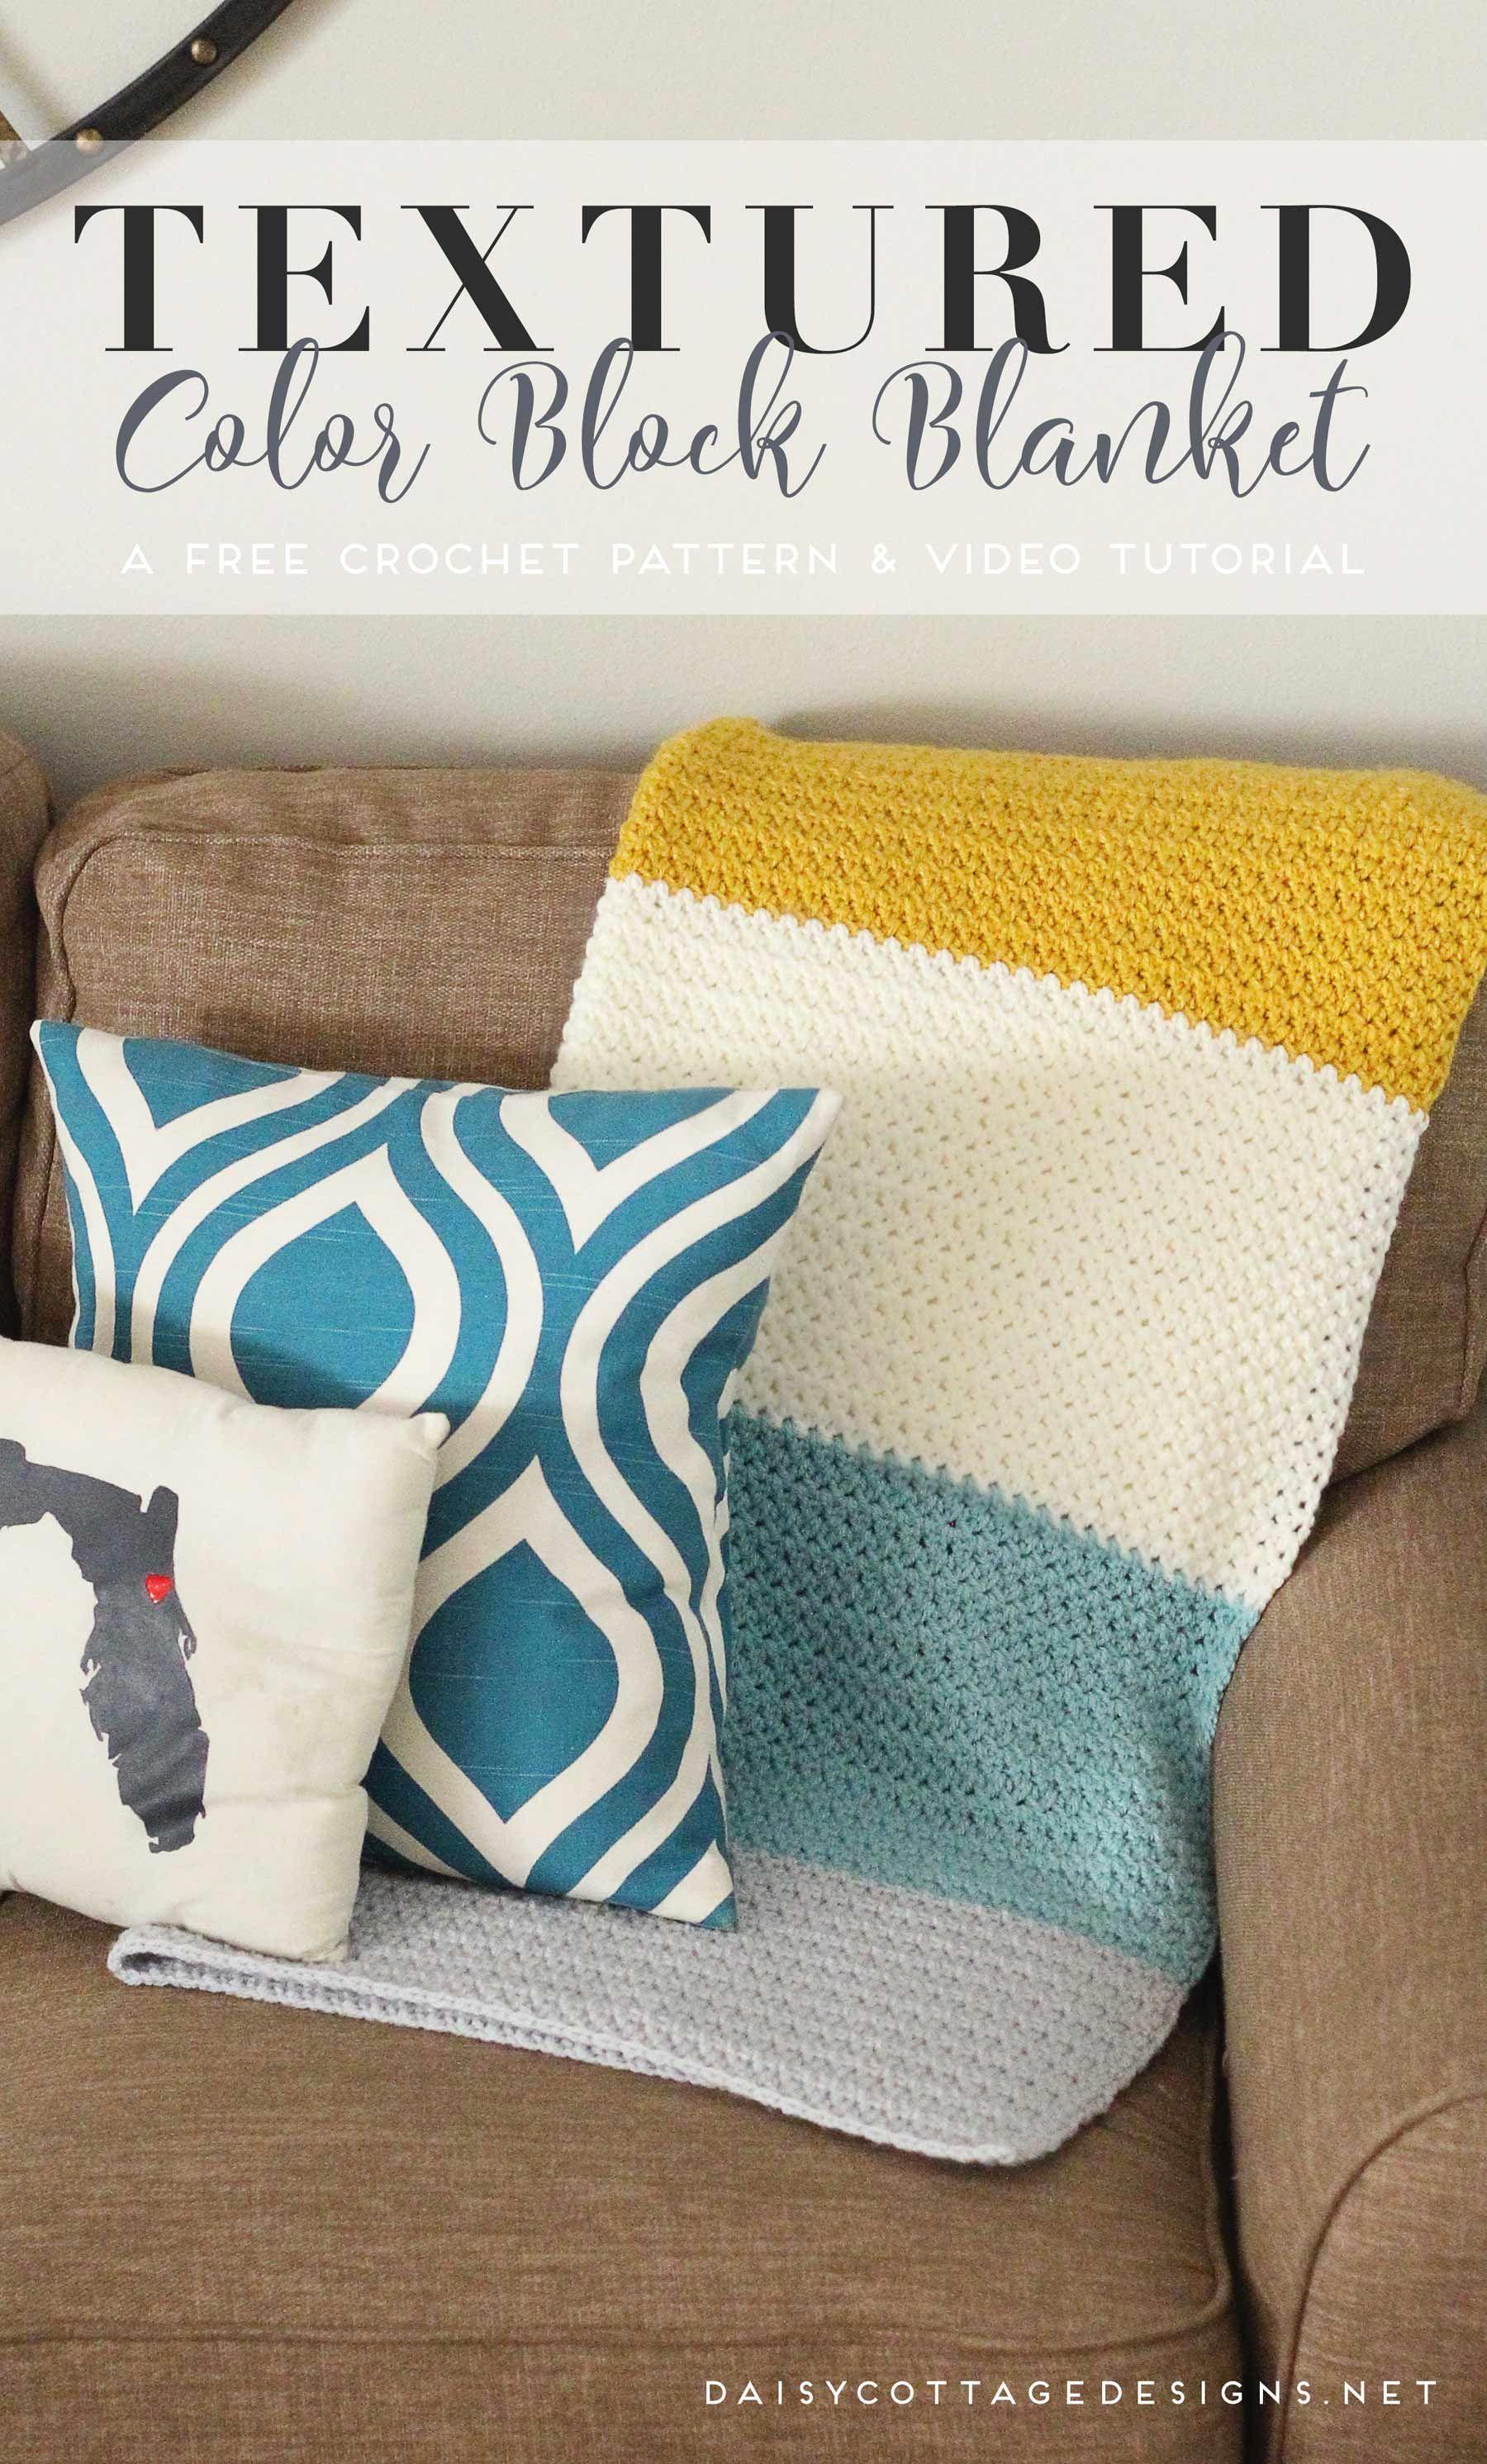 Color Block Blanket Crochet Pattern   Pinterest   Colchas, Telar y Manta